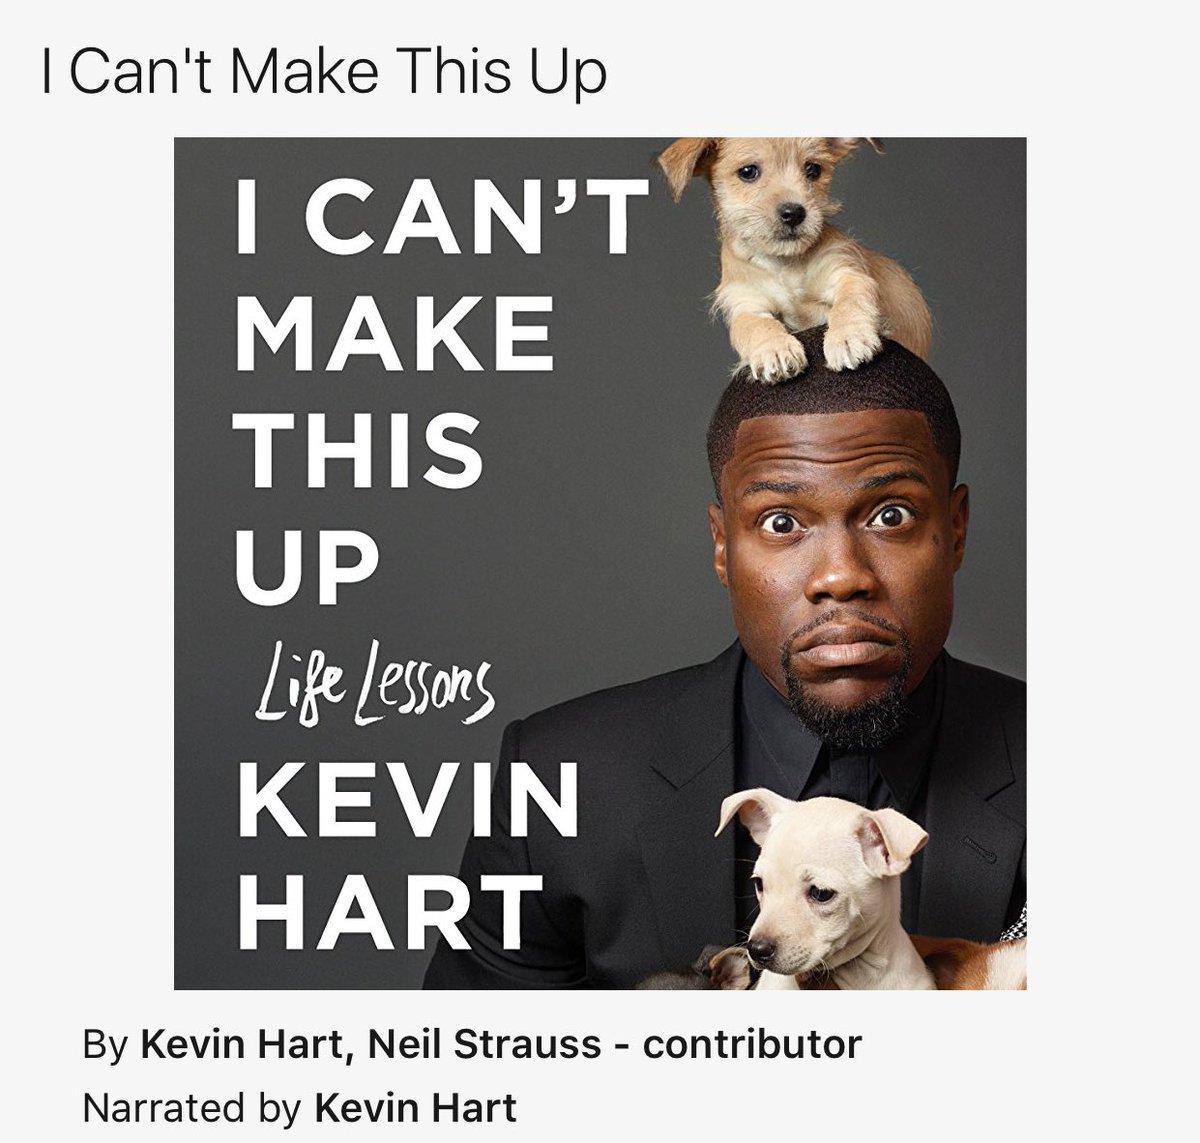 Kevin Hart (@KevinHart4real)